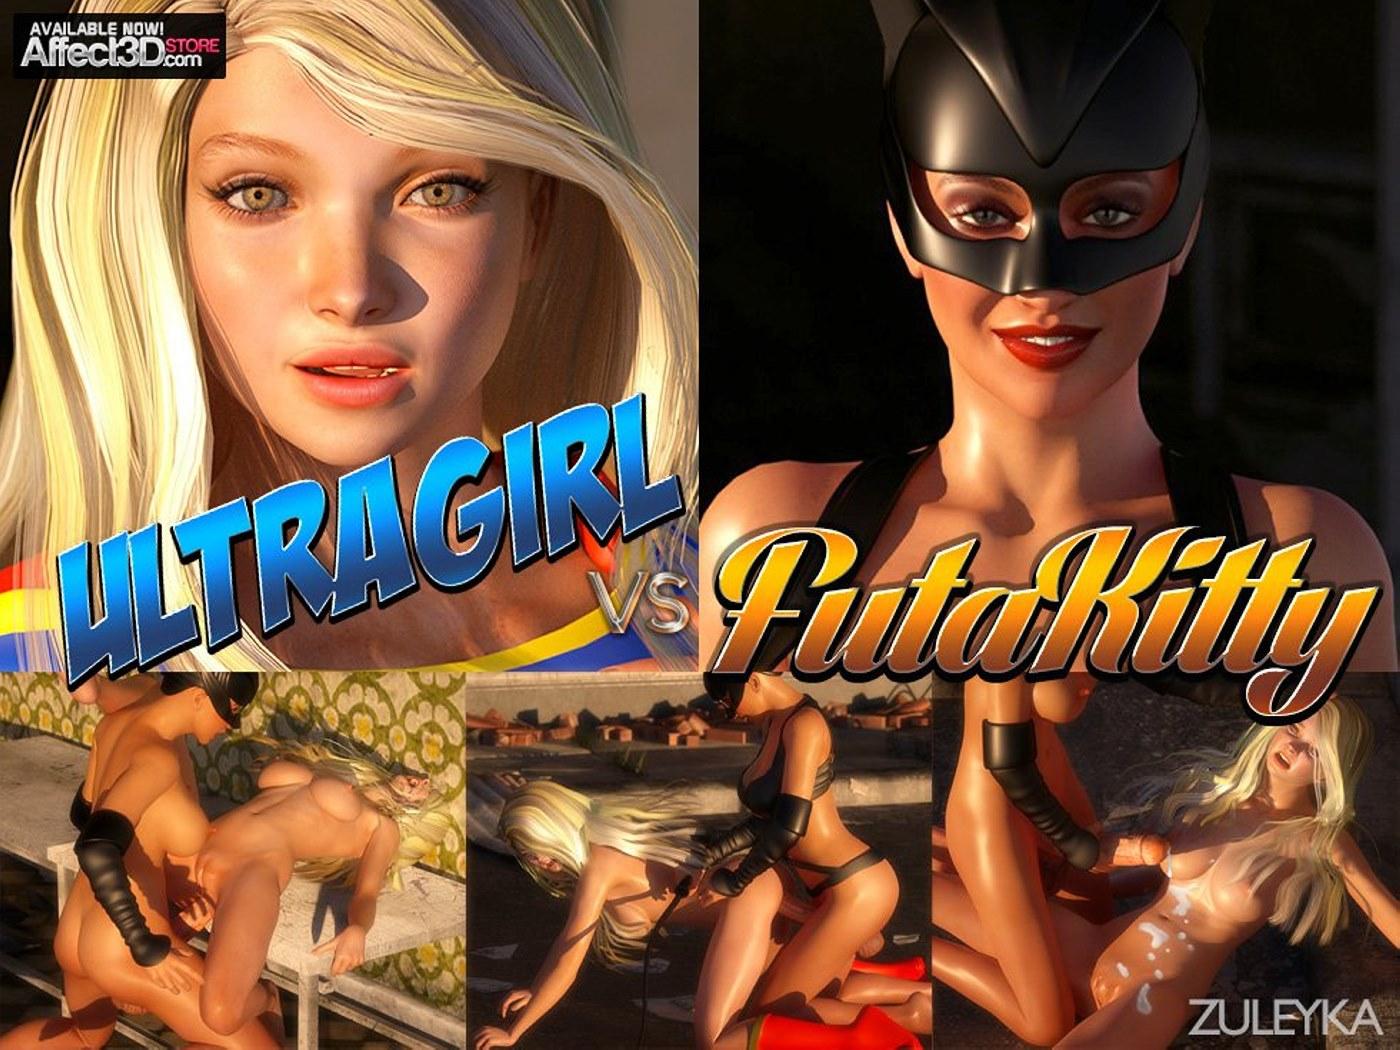 Zuleyka – Ultragirl Vs Futakitty- Affect3D image 1